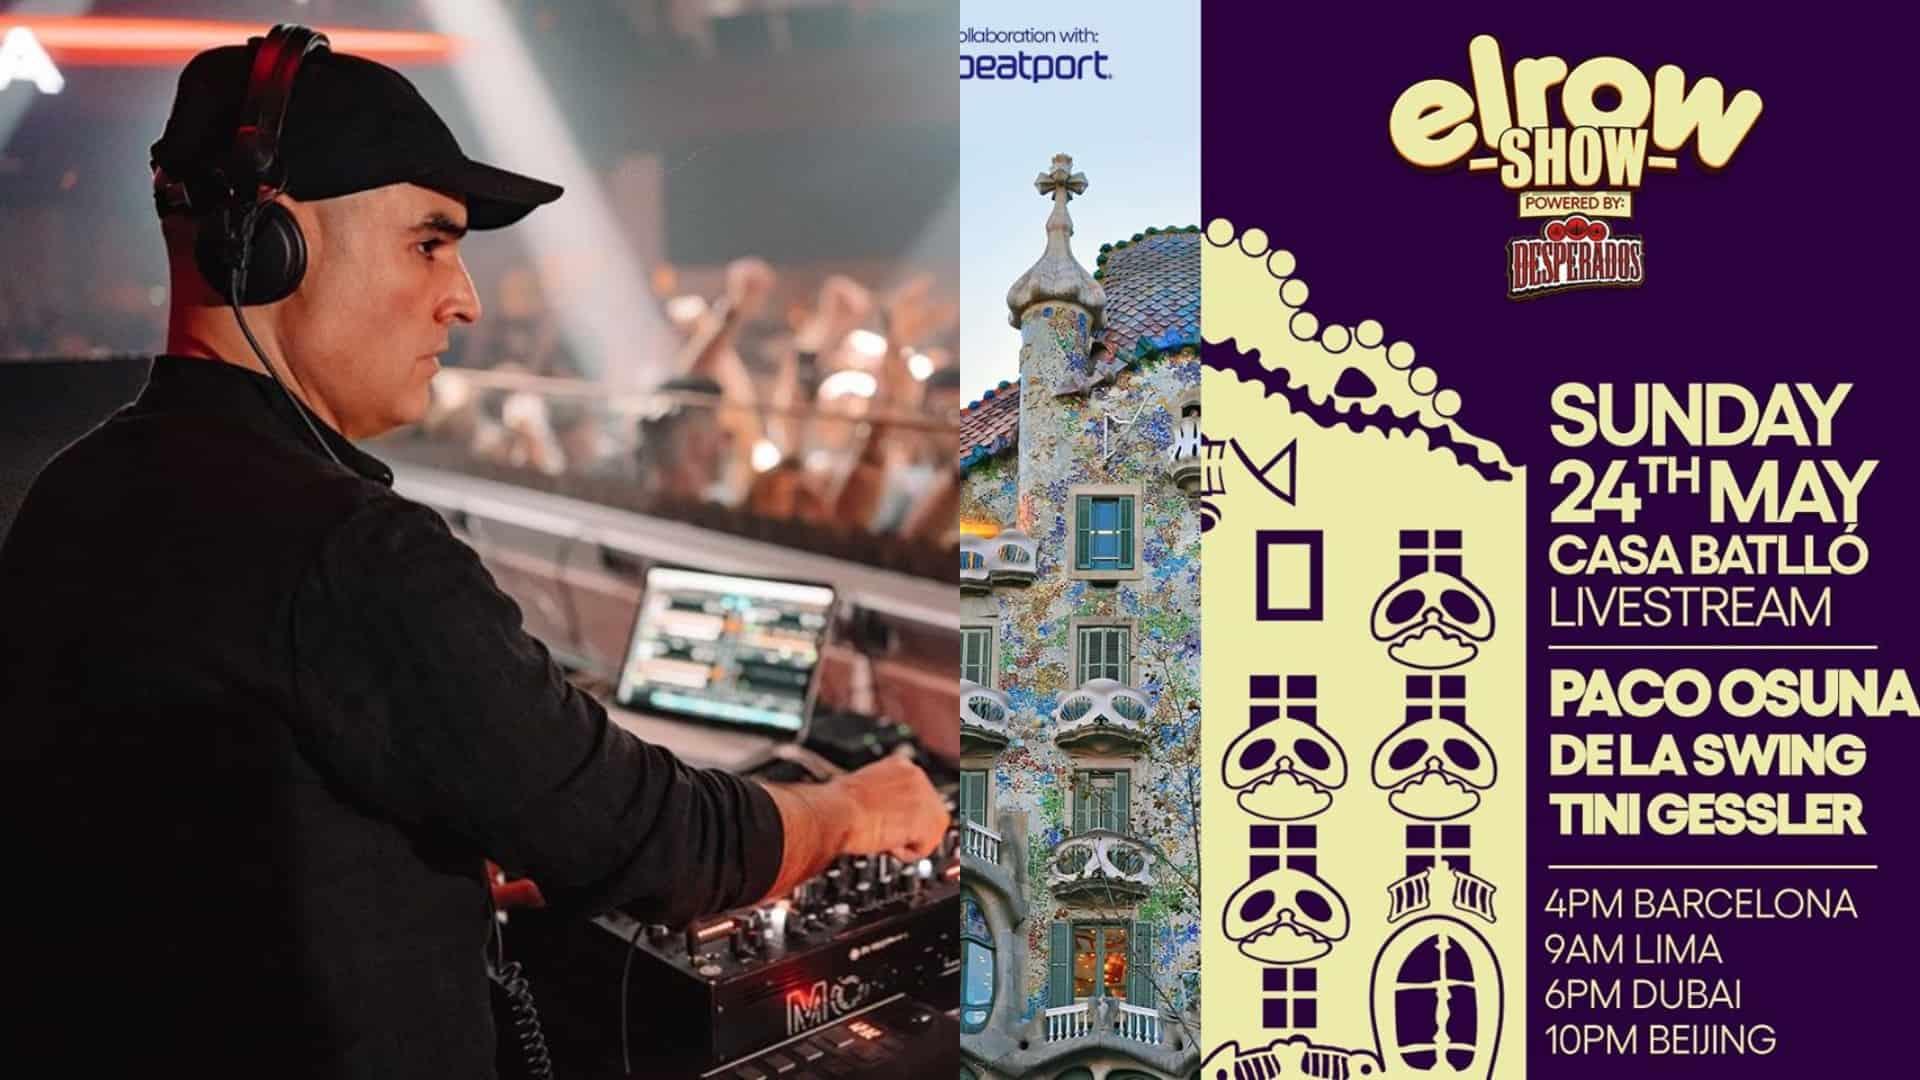 Desperados Elrow Set To Host Unique Live Streamed Party From Casa Batllo In Barcelona Edmli